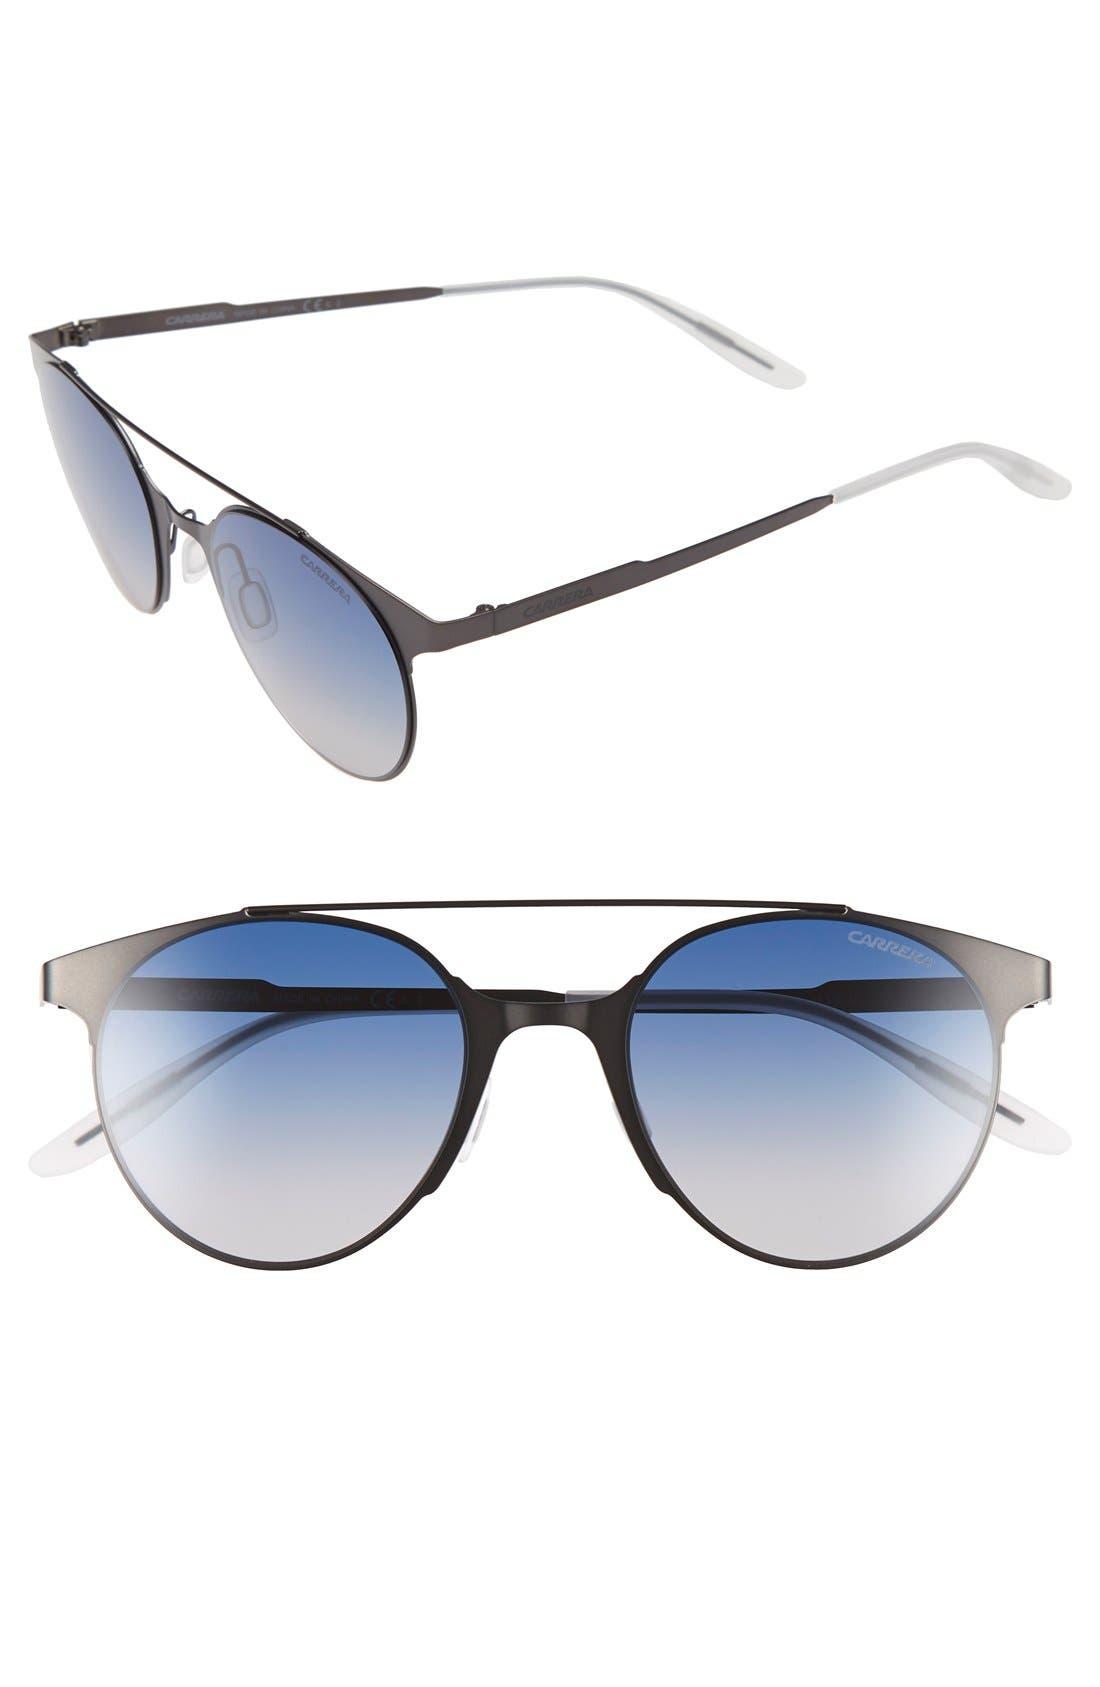 CARRERA EYEWEAR 50mm Retro Sunglasses